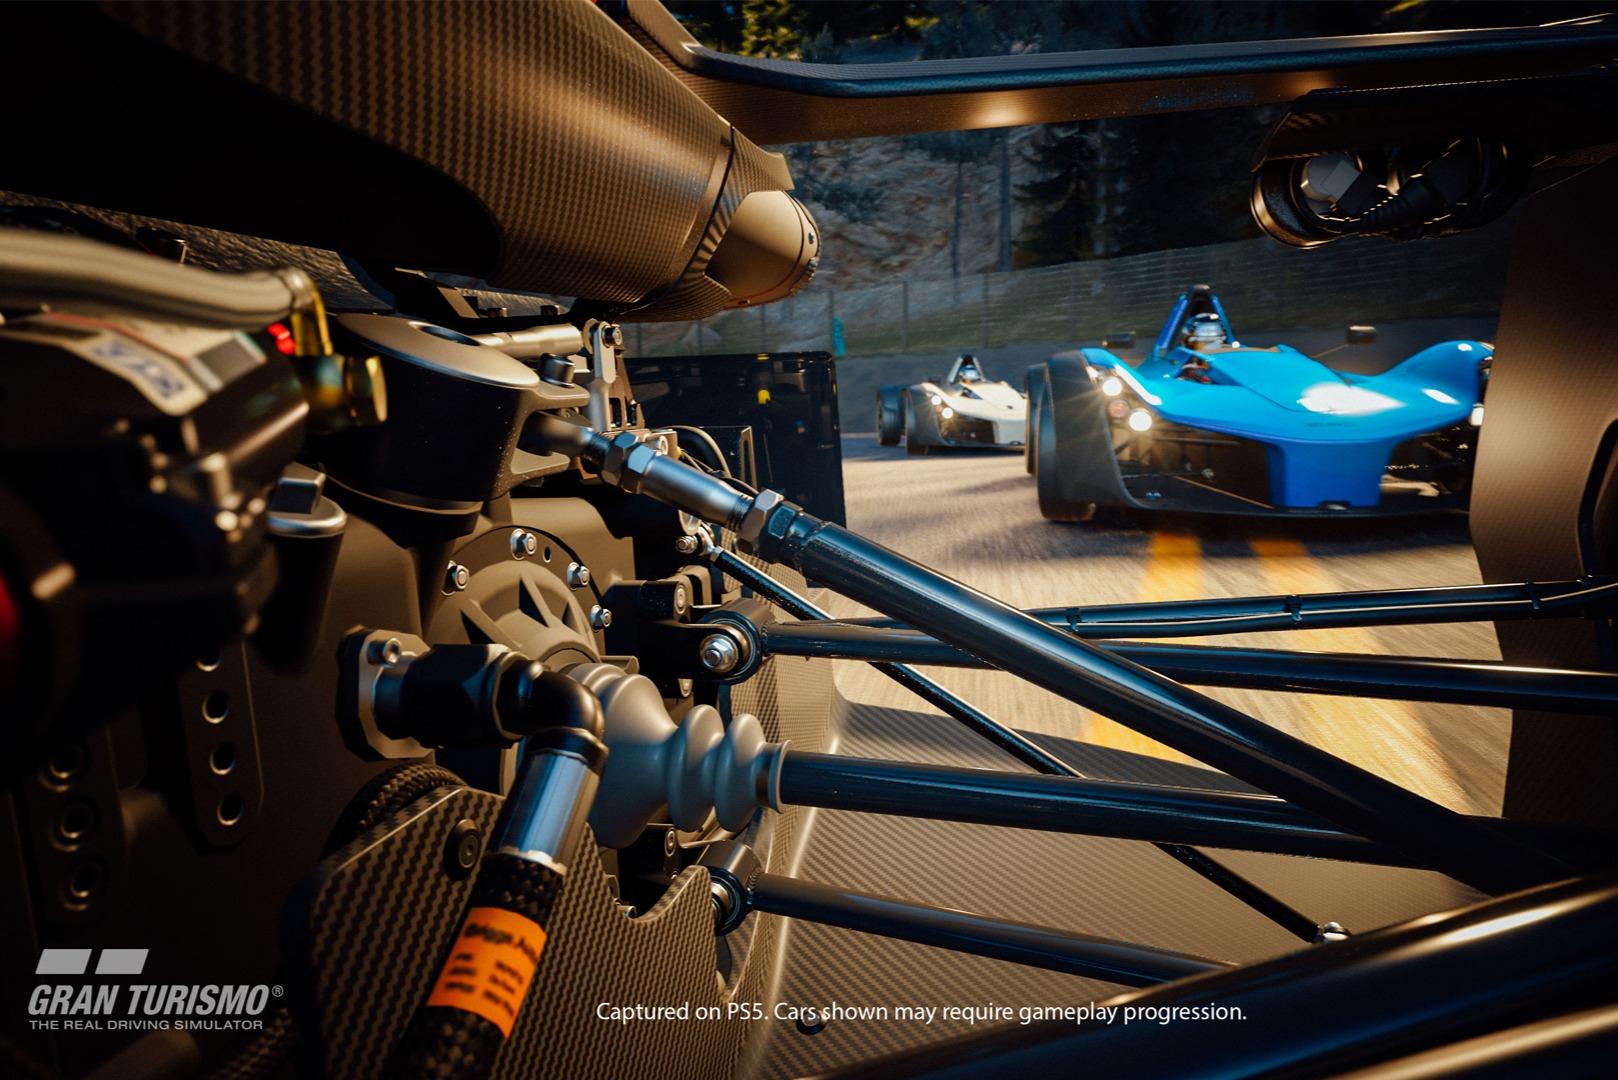 Fanatec and Gran Turismo developer accomplice to create new sim racing merchandise - Motor Informed